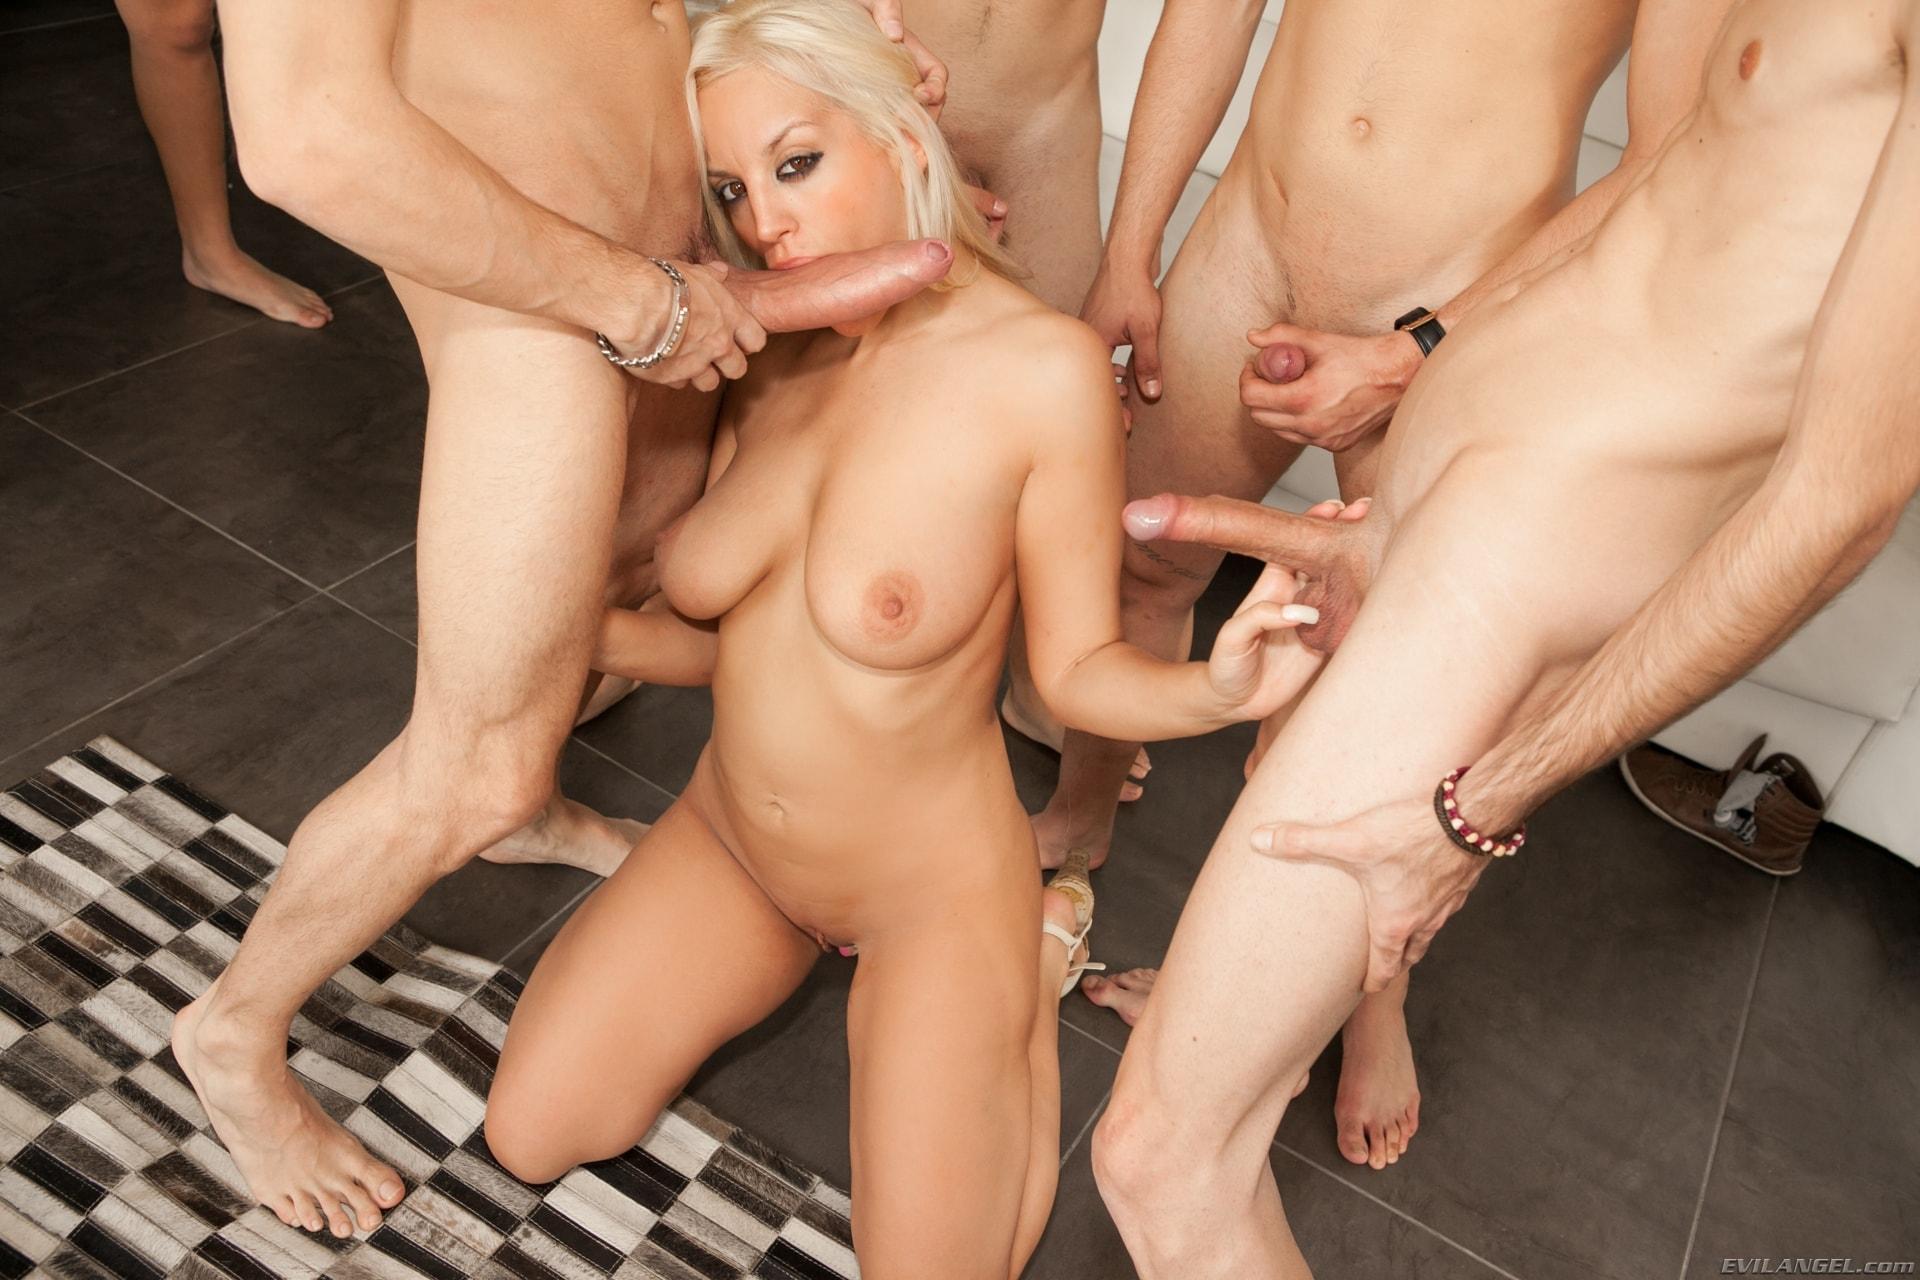 Evil Angel 'Nacho's Fucking Amateurs 02: Gangbangs' starring Blondie Fesser (Photo 3)